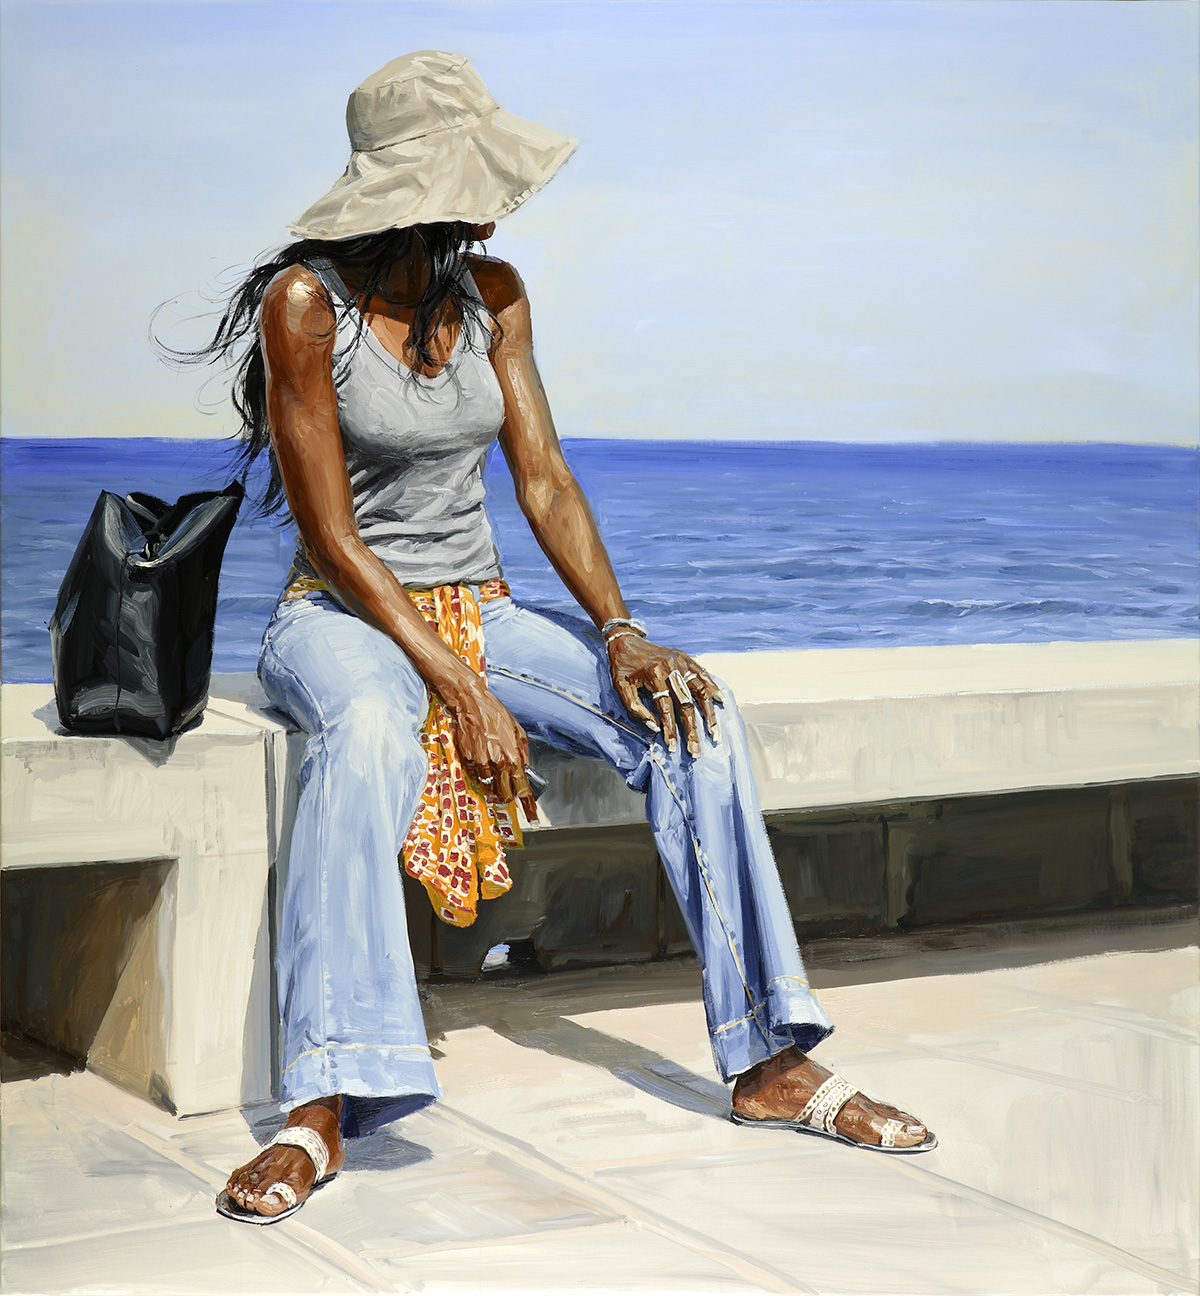 girl-black-sunny-sea-hat-162x150cm.jpg